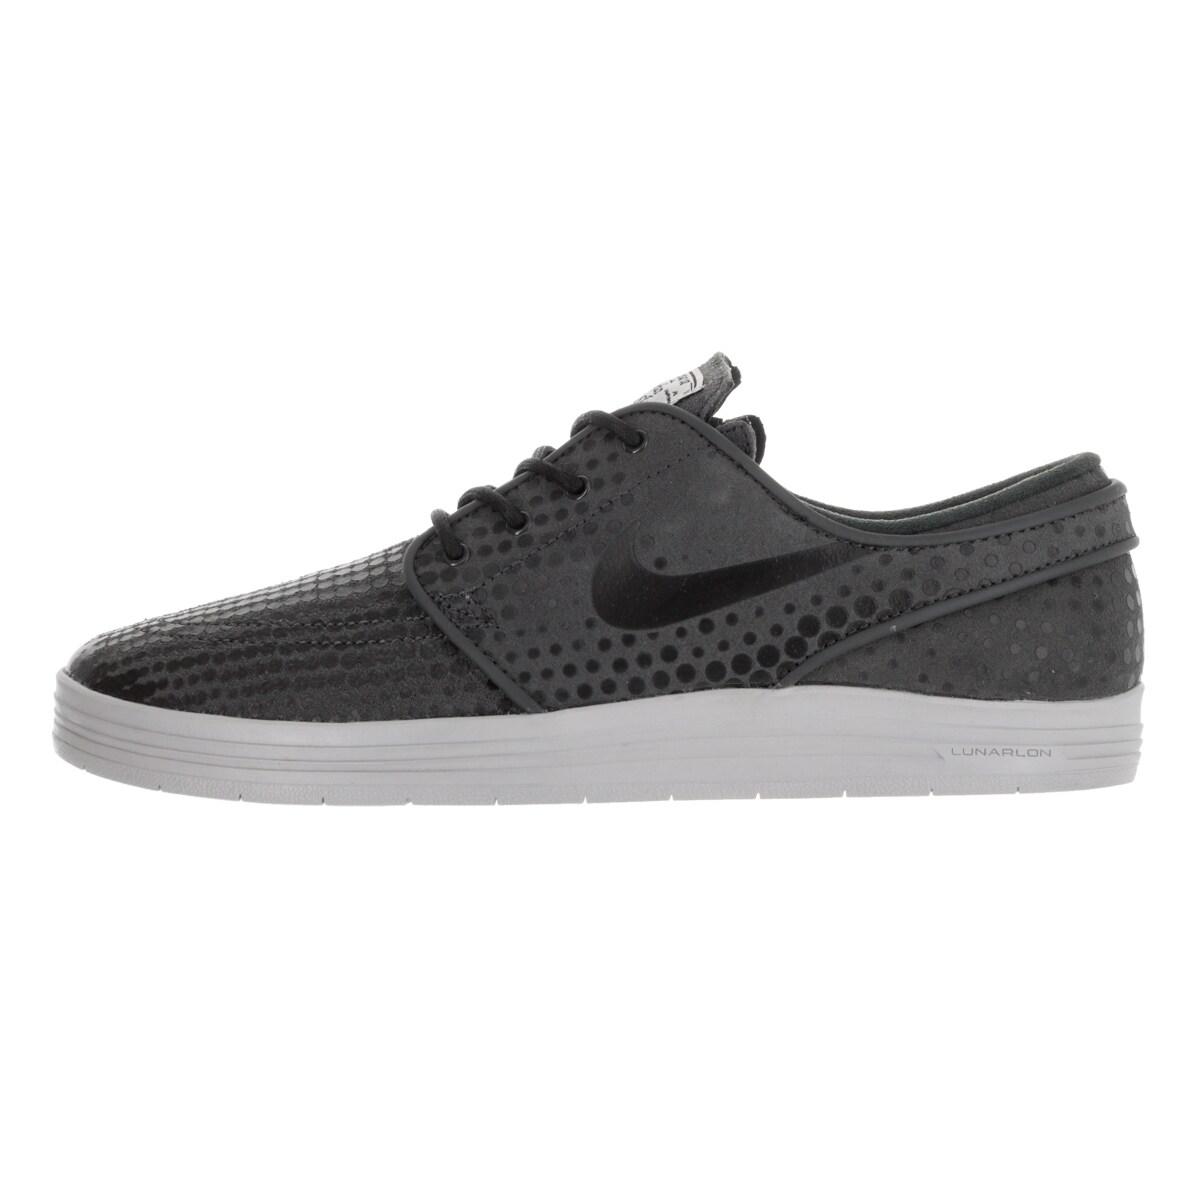 promo code 92472 facd8 Shop Nike Men s Lunar Stefan Janoski Anthracite Black Wolf Grey Skate Shoe  - Free Shipping Today - Overstock - 13394109